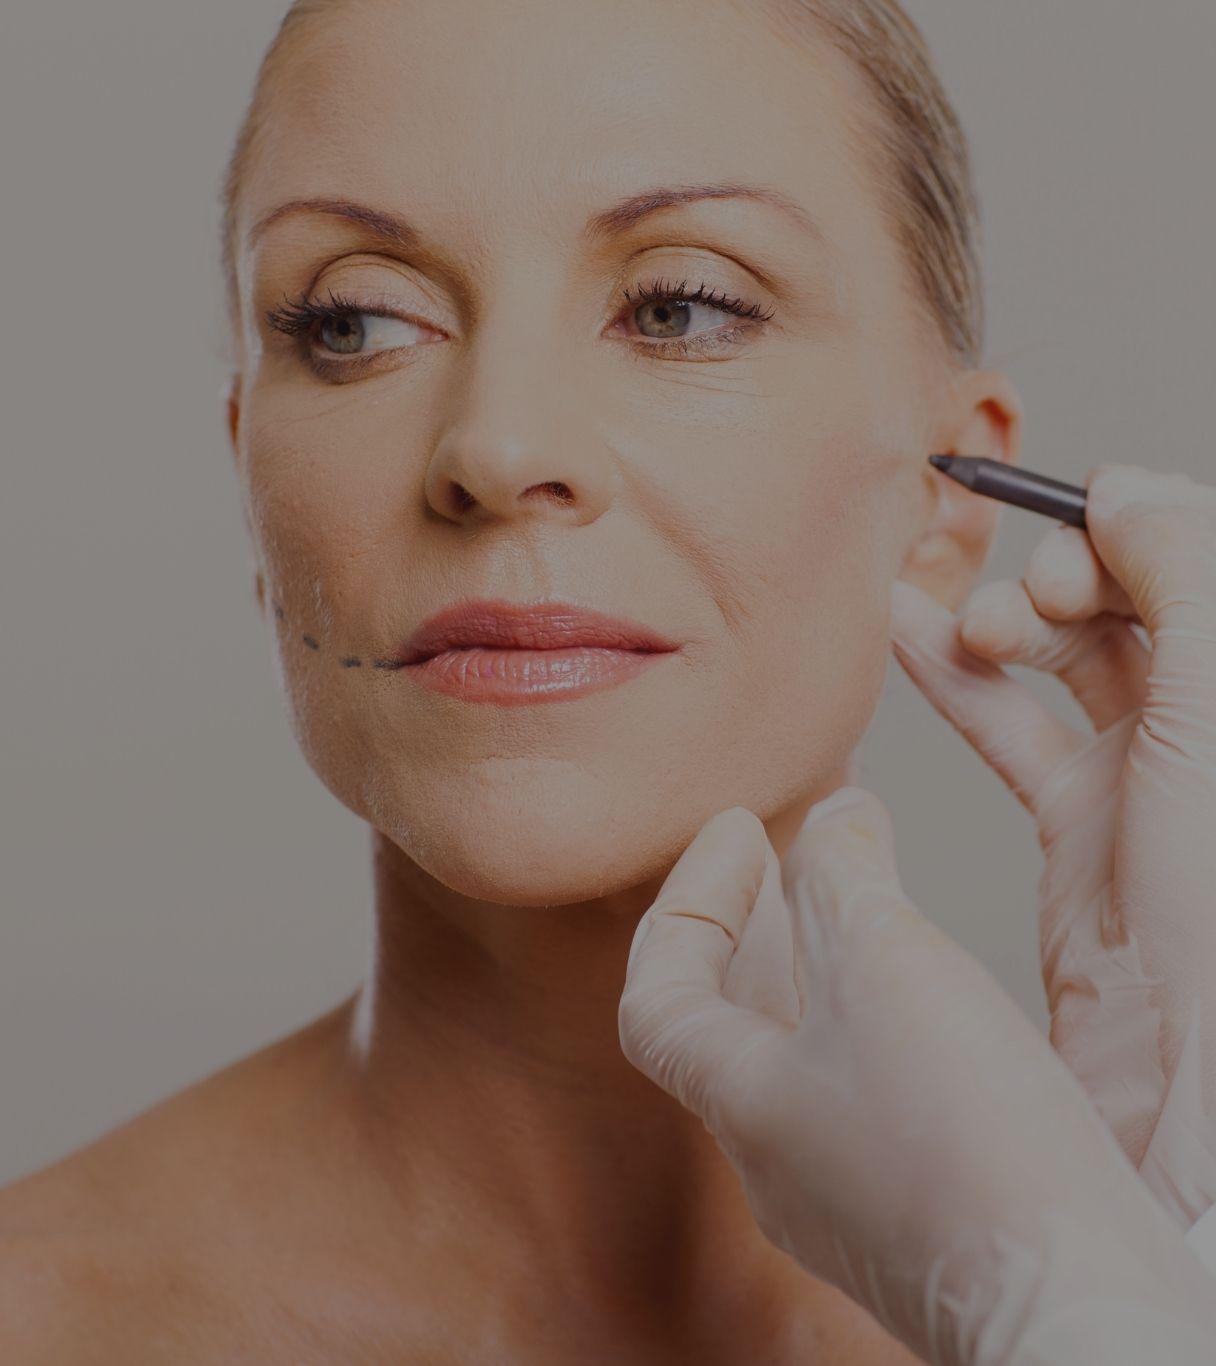 medicina estética facial mujer